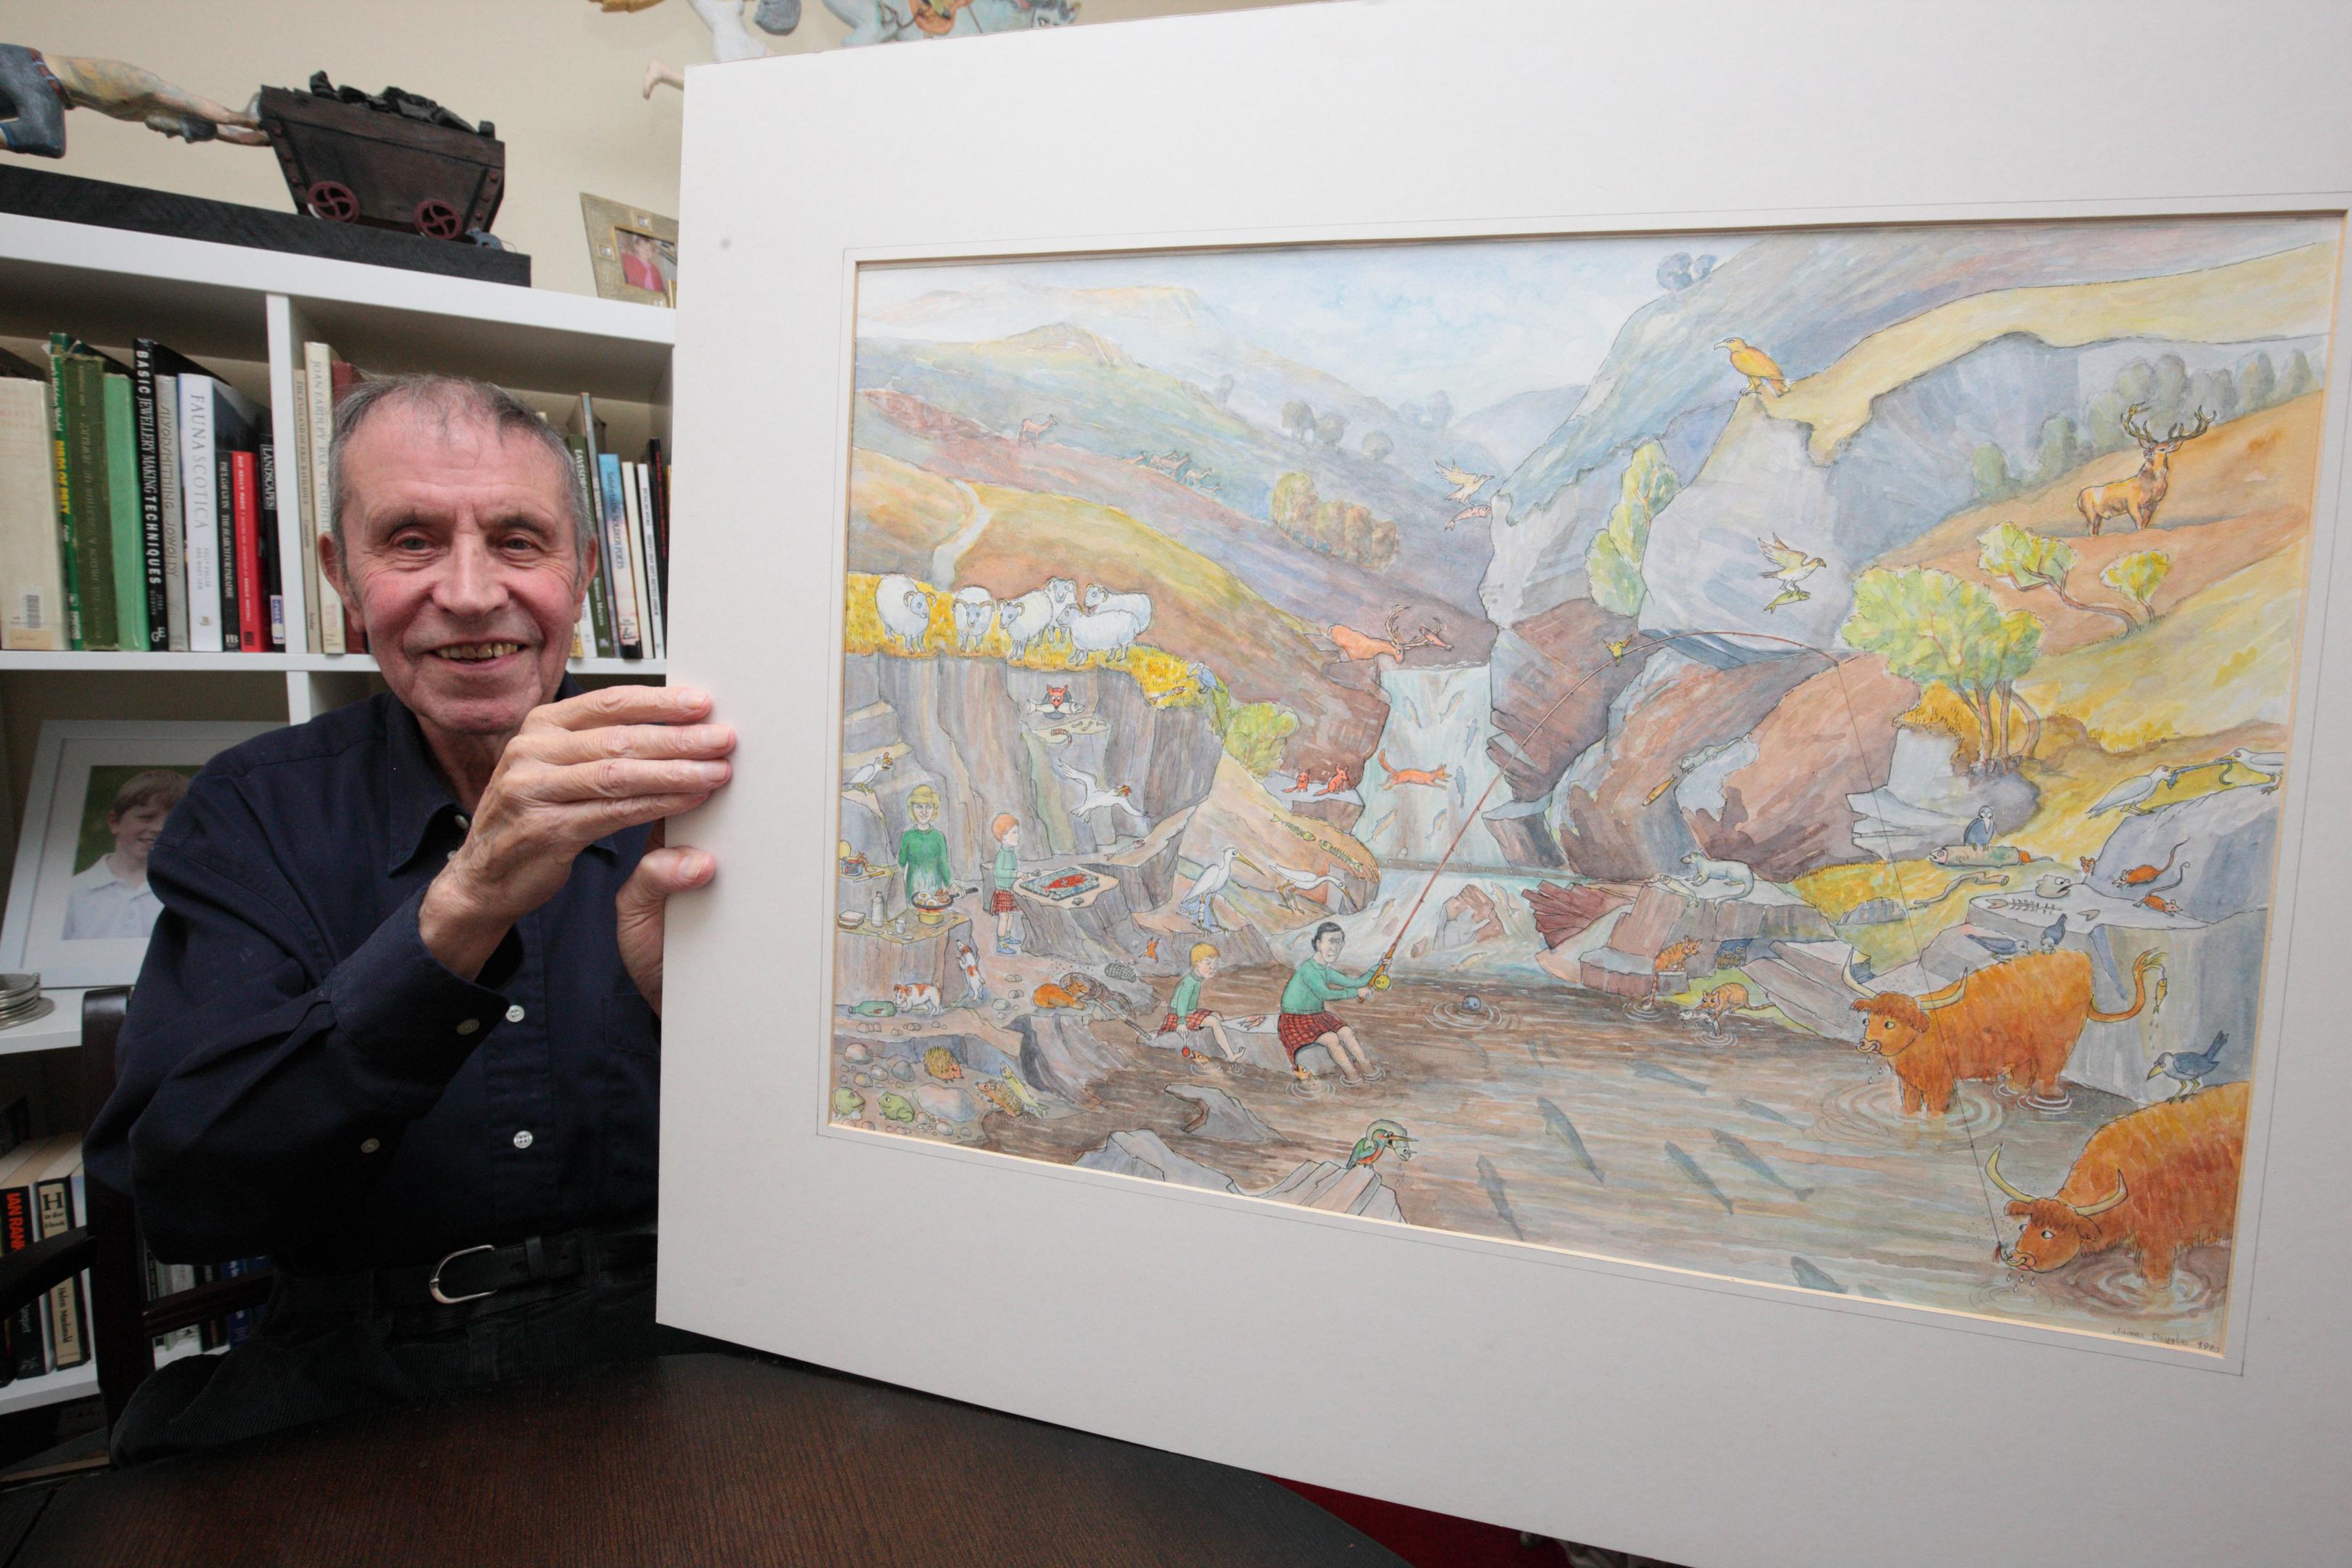 Retired art teacher Jim Douglas recalls the royals in happier times.